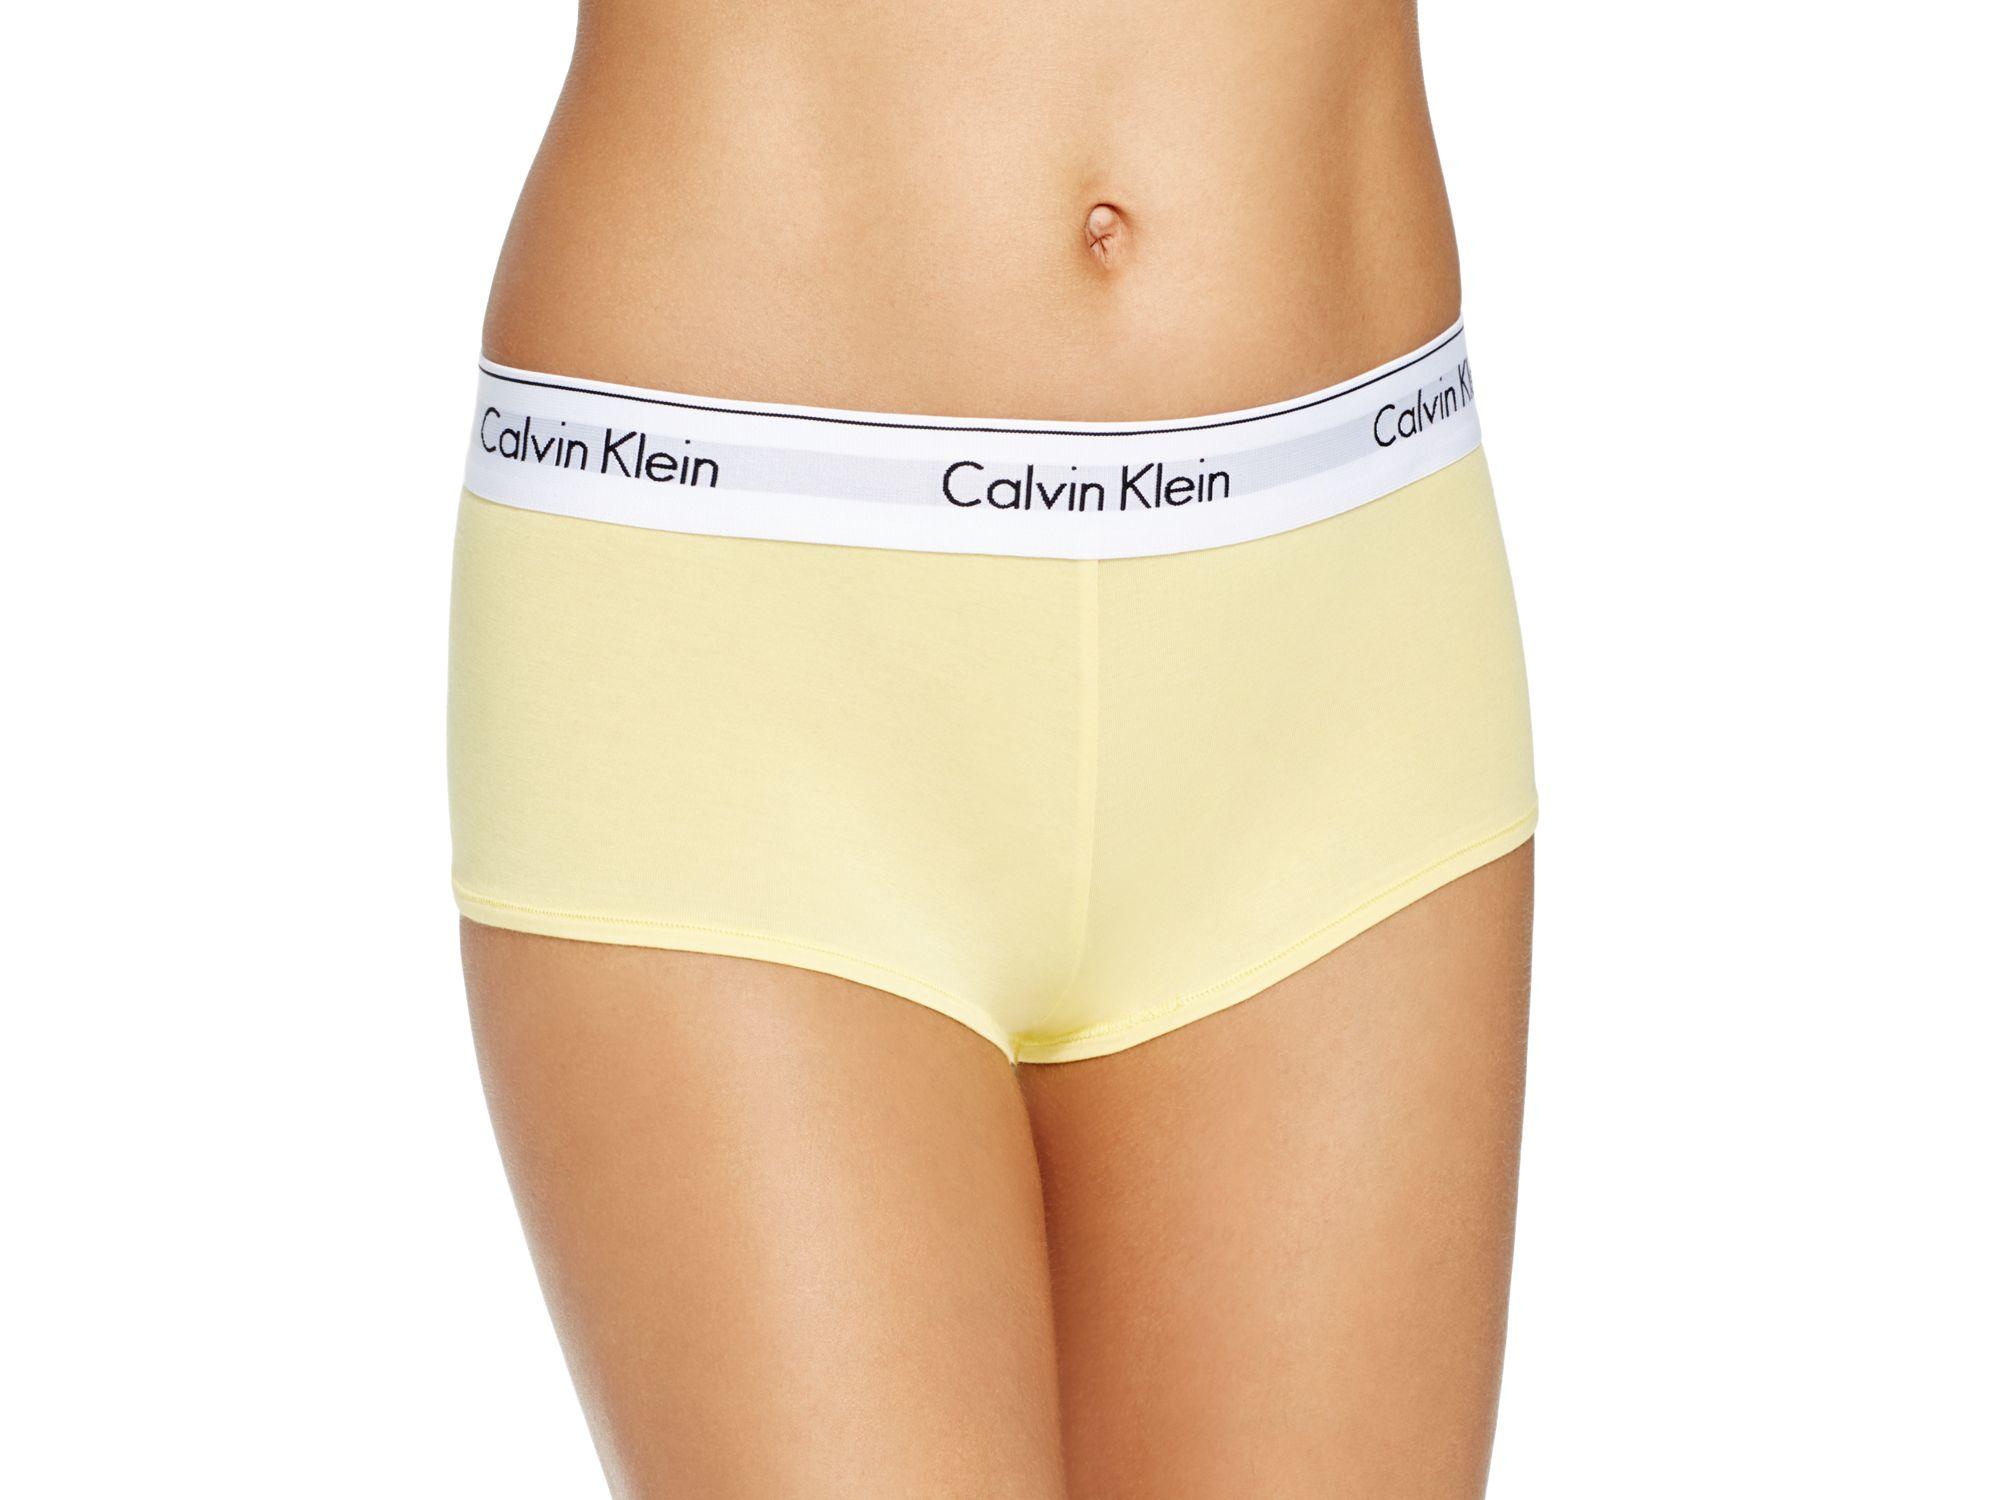 812417ae5f Lyst - Calvin Klein Boyshort - Modern Cotton  f3788 in Yellow